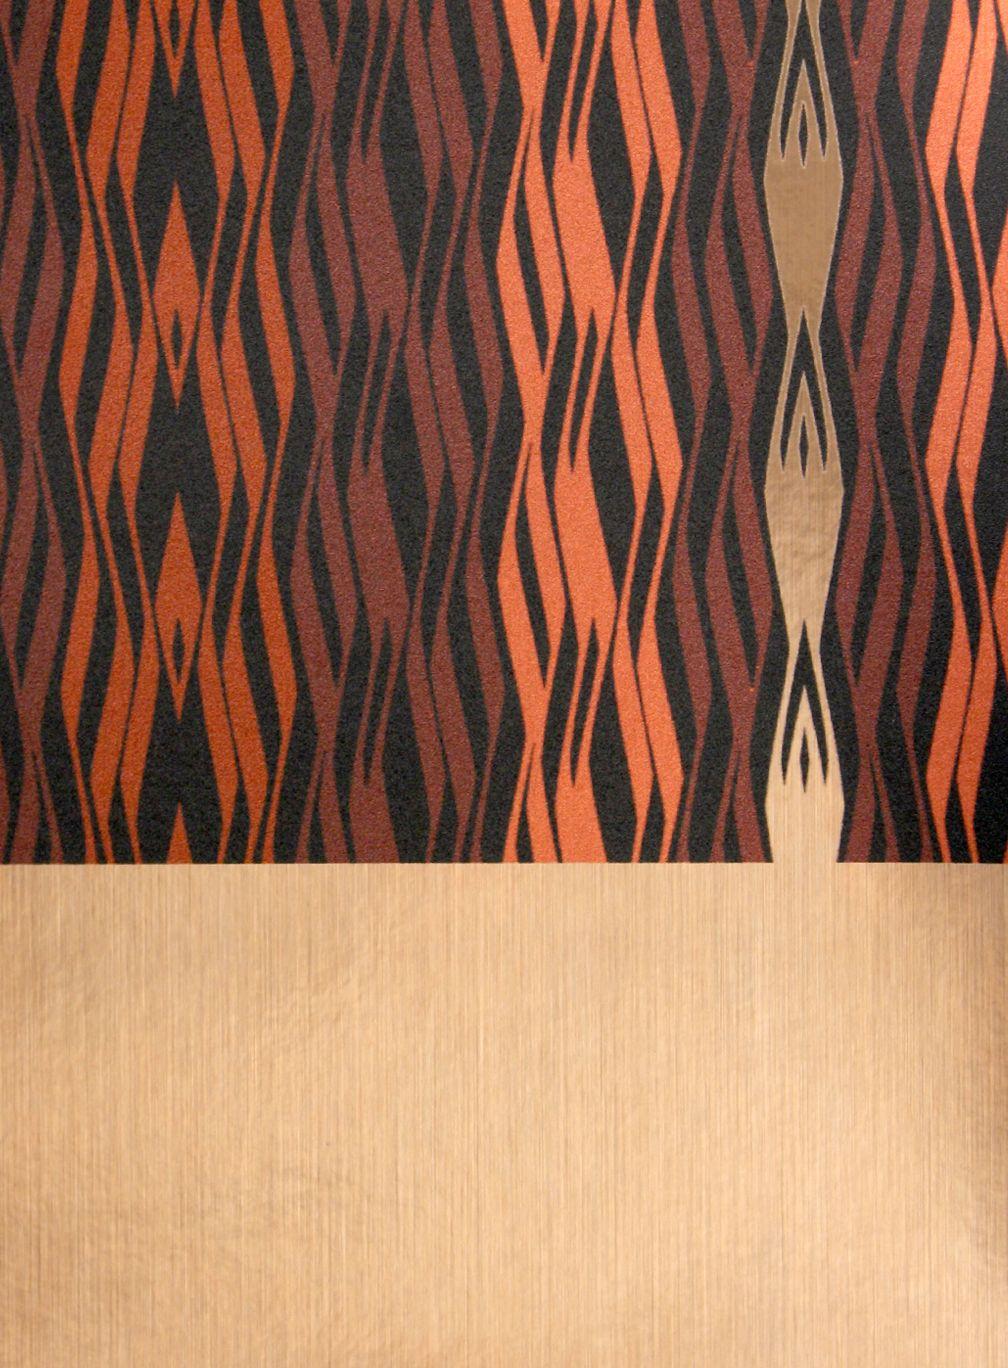 Carpets & Rugs Mat Original Abstract Geometric Triangles Background Door Mat Floor Carpet For Living Room Doormat Entrance Rug Anti-slip Doormat Home Decor Driving A Roaring Trade